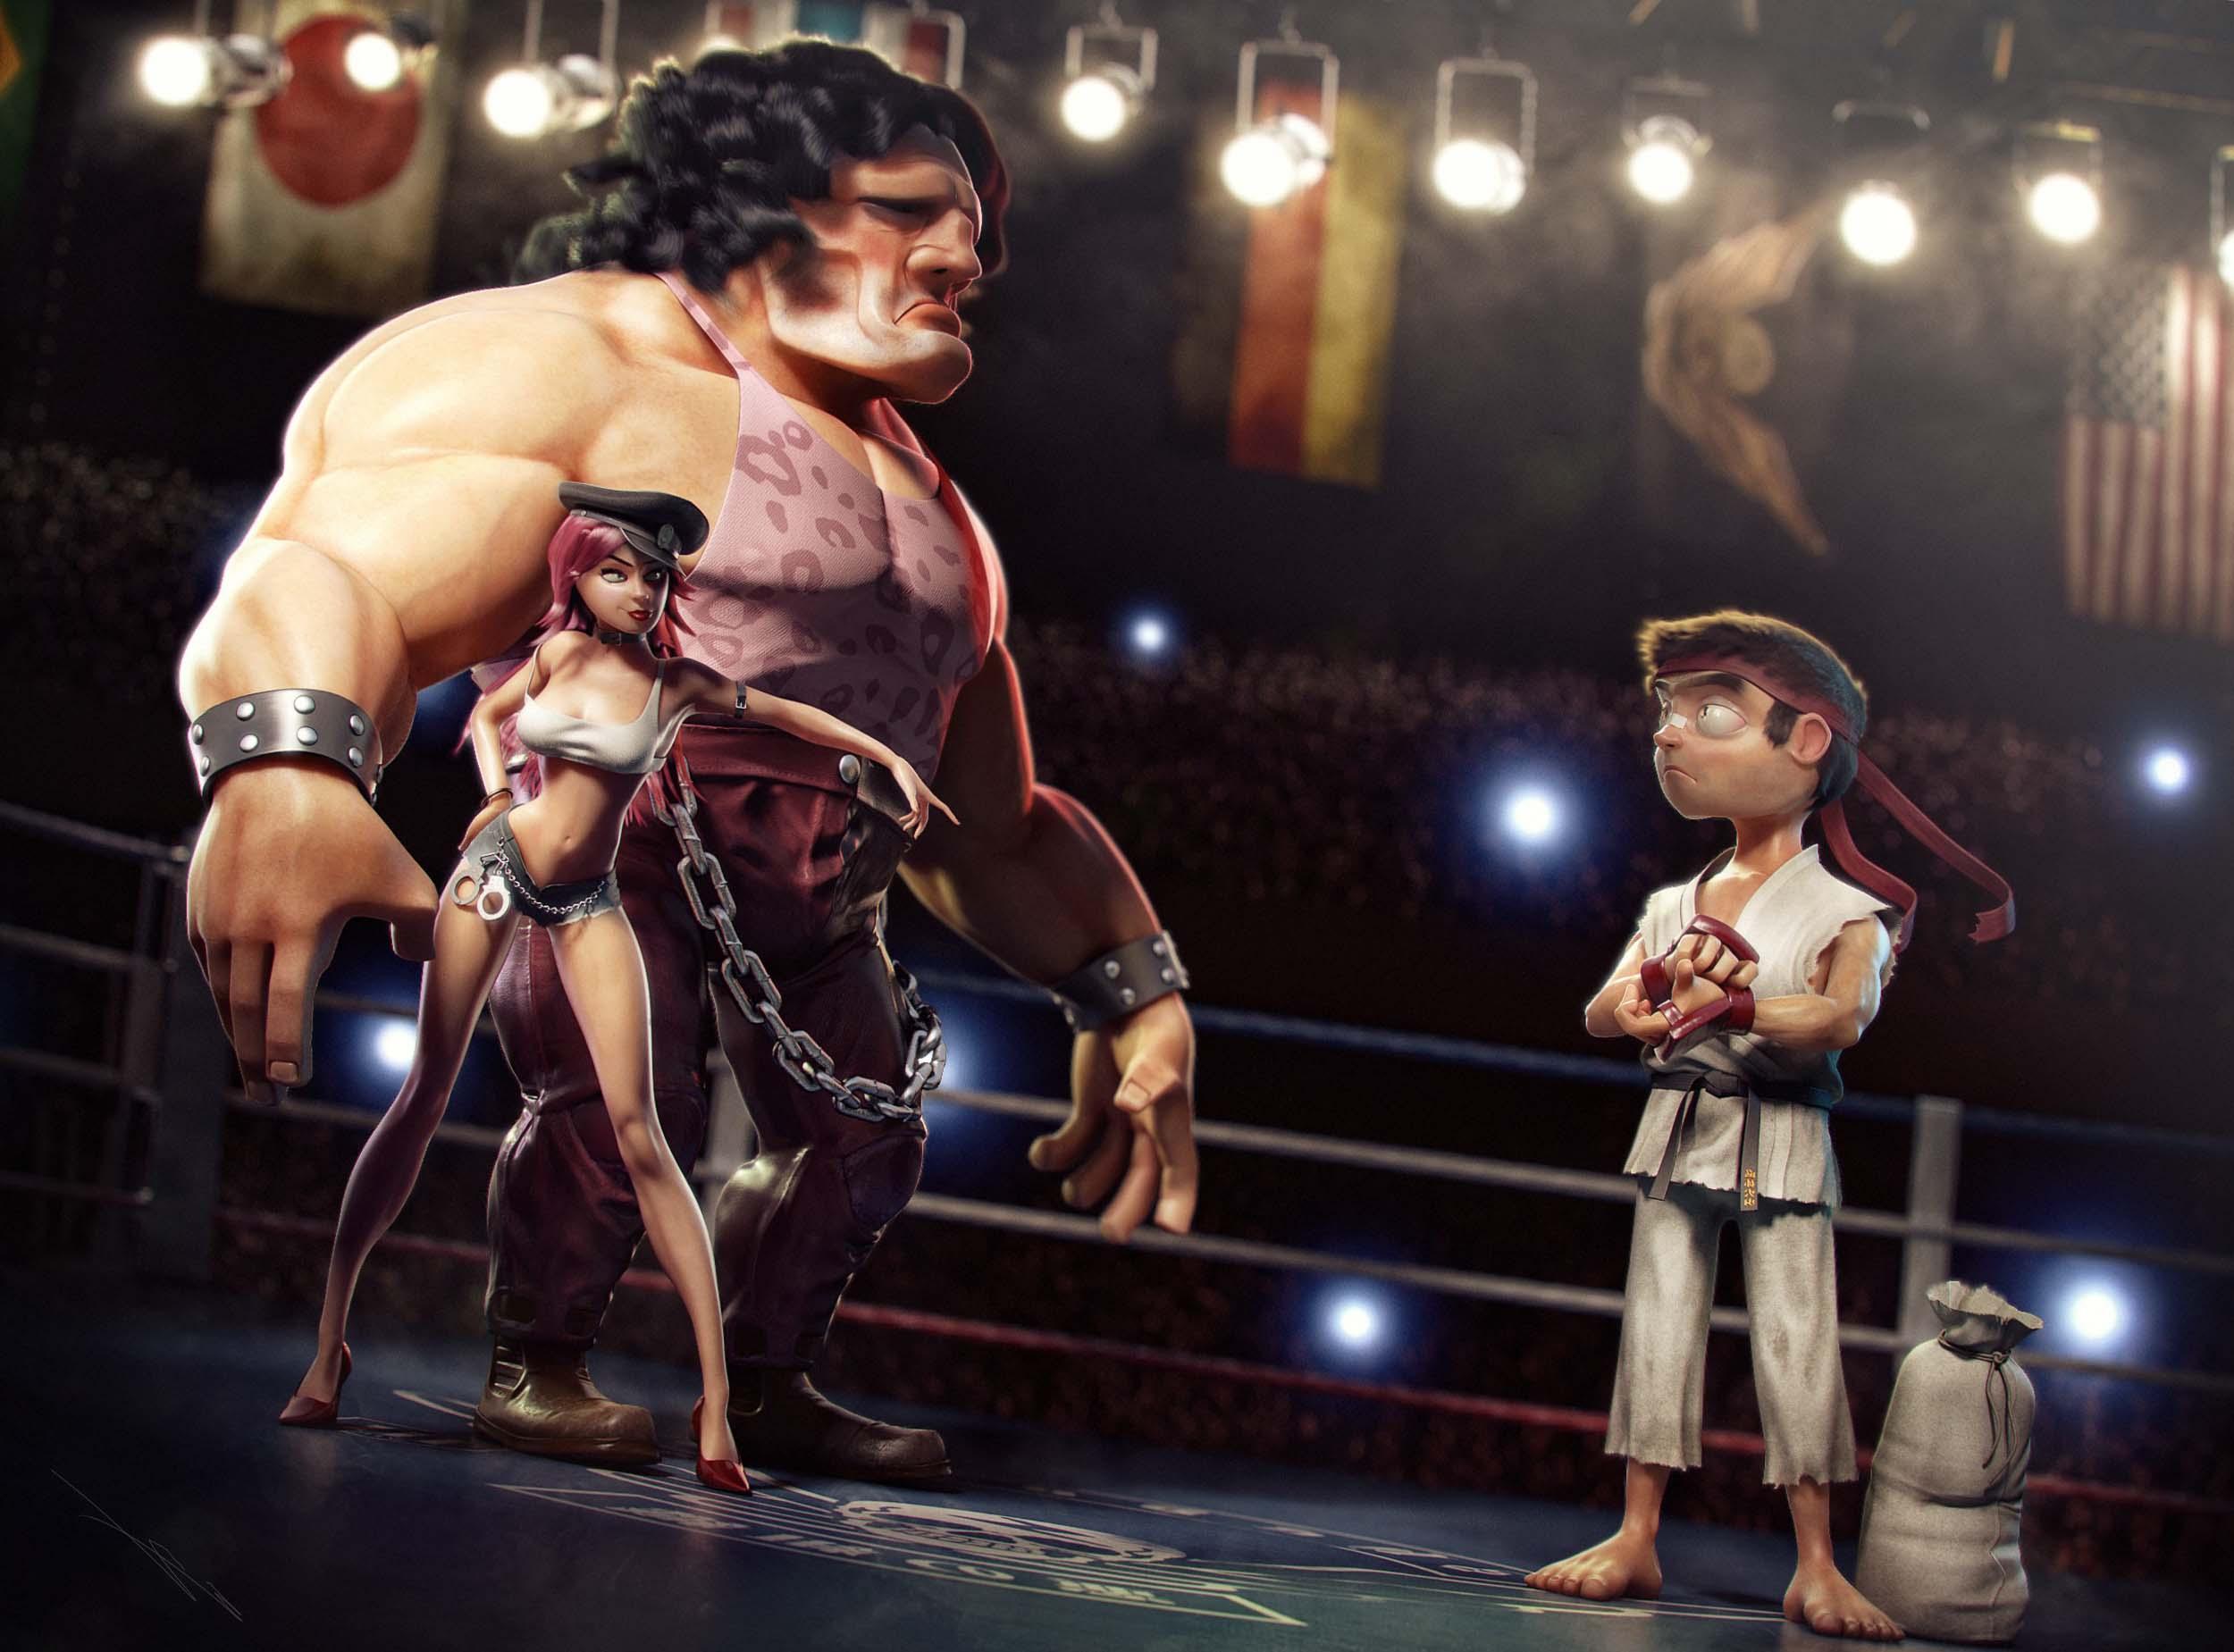 Fondos De Pantalla Boxeo Muay Thai Obras De Arte